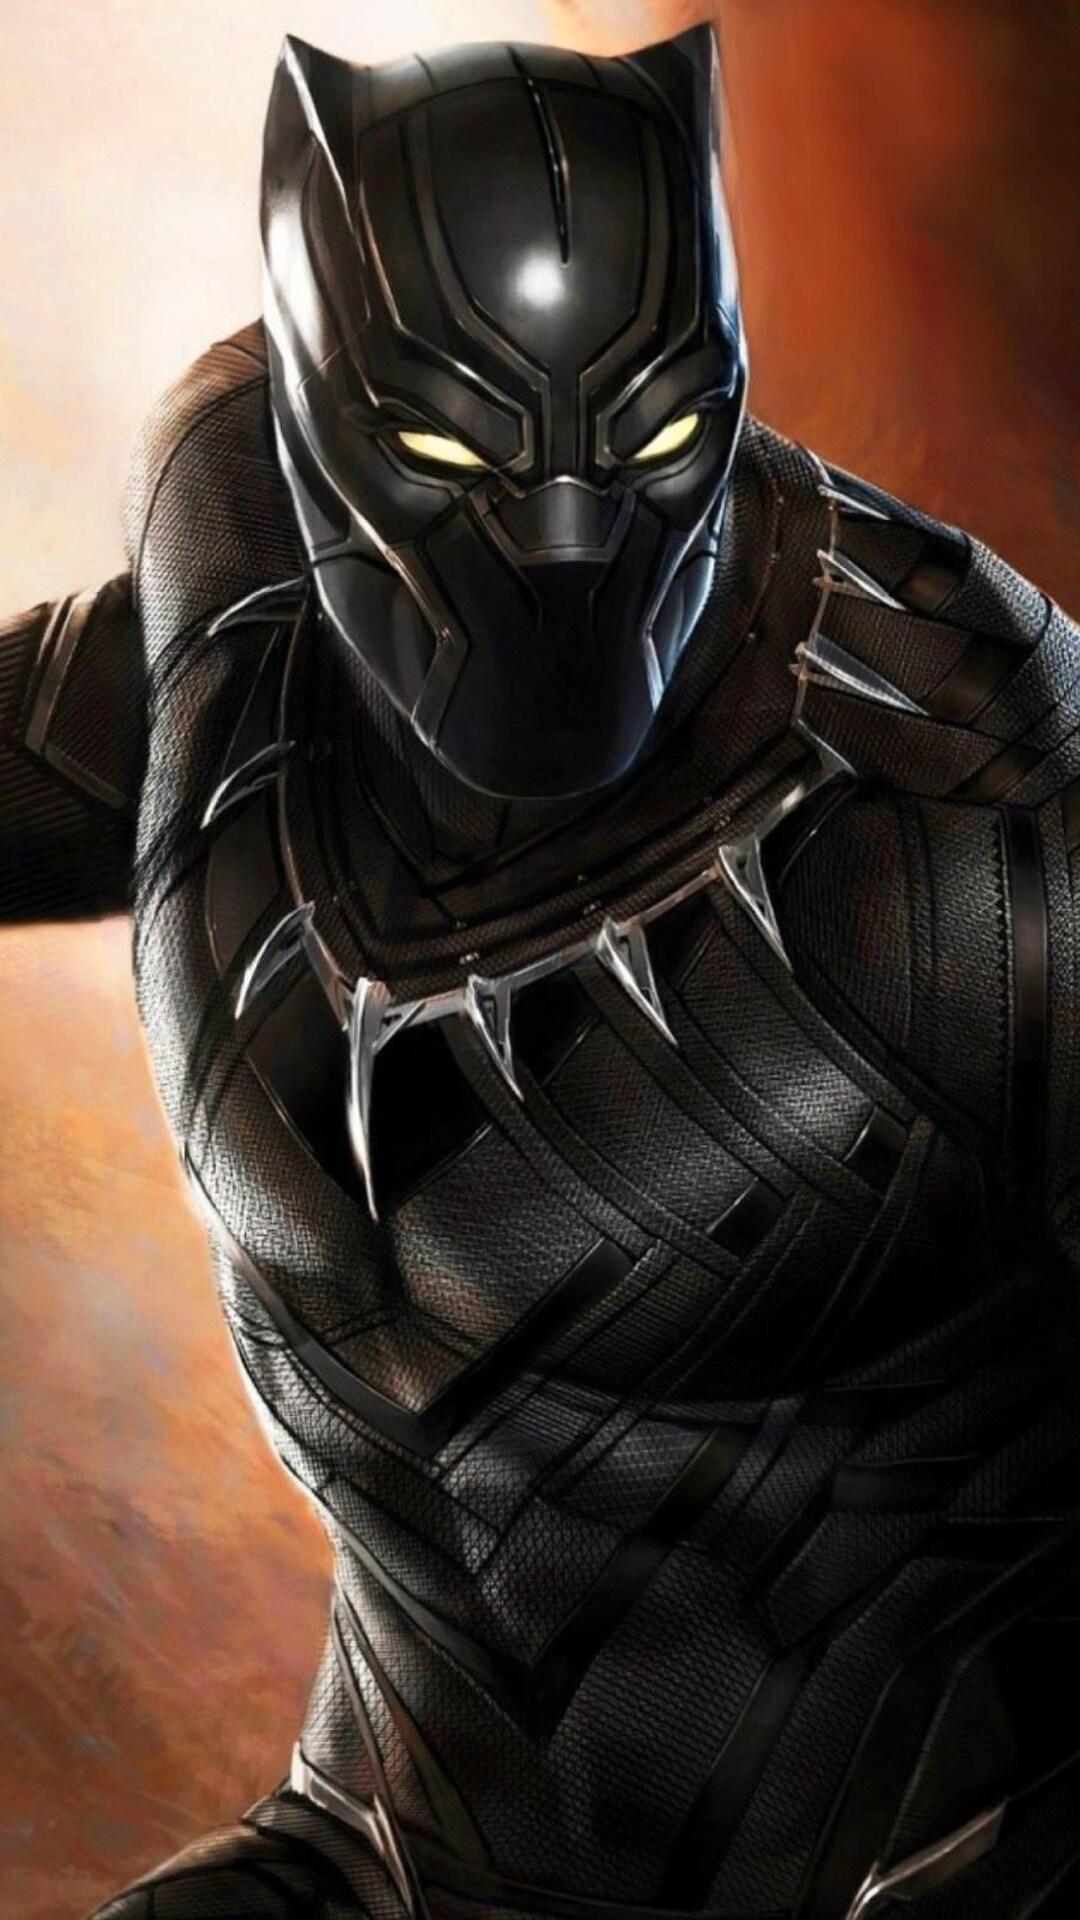 Most Inspiring Wallpaper Marvel Iphone 5 - black-panther-super-hero-4k-1080x1920  Pic_611537.jpg